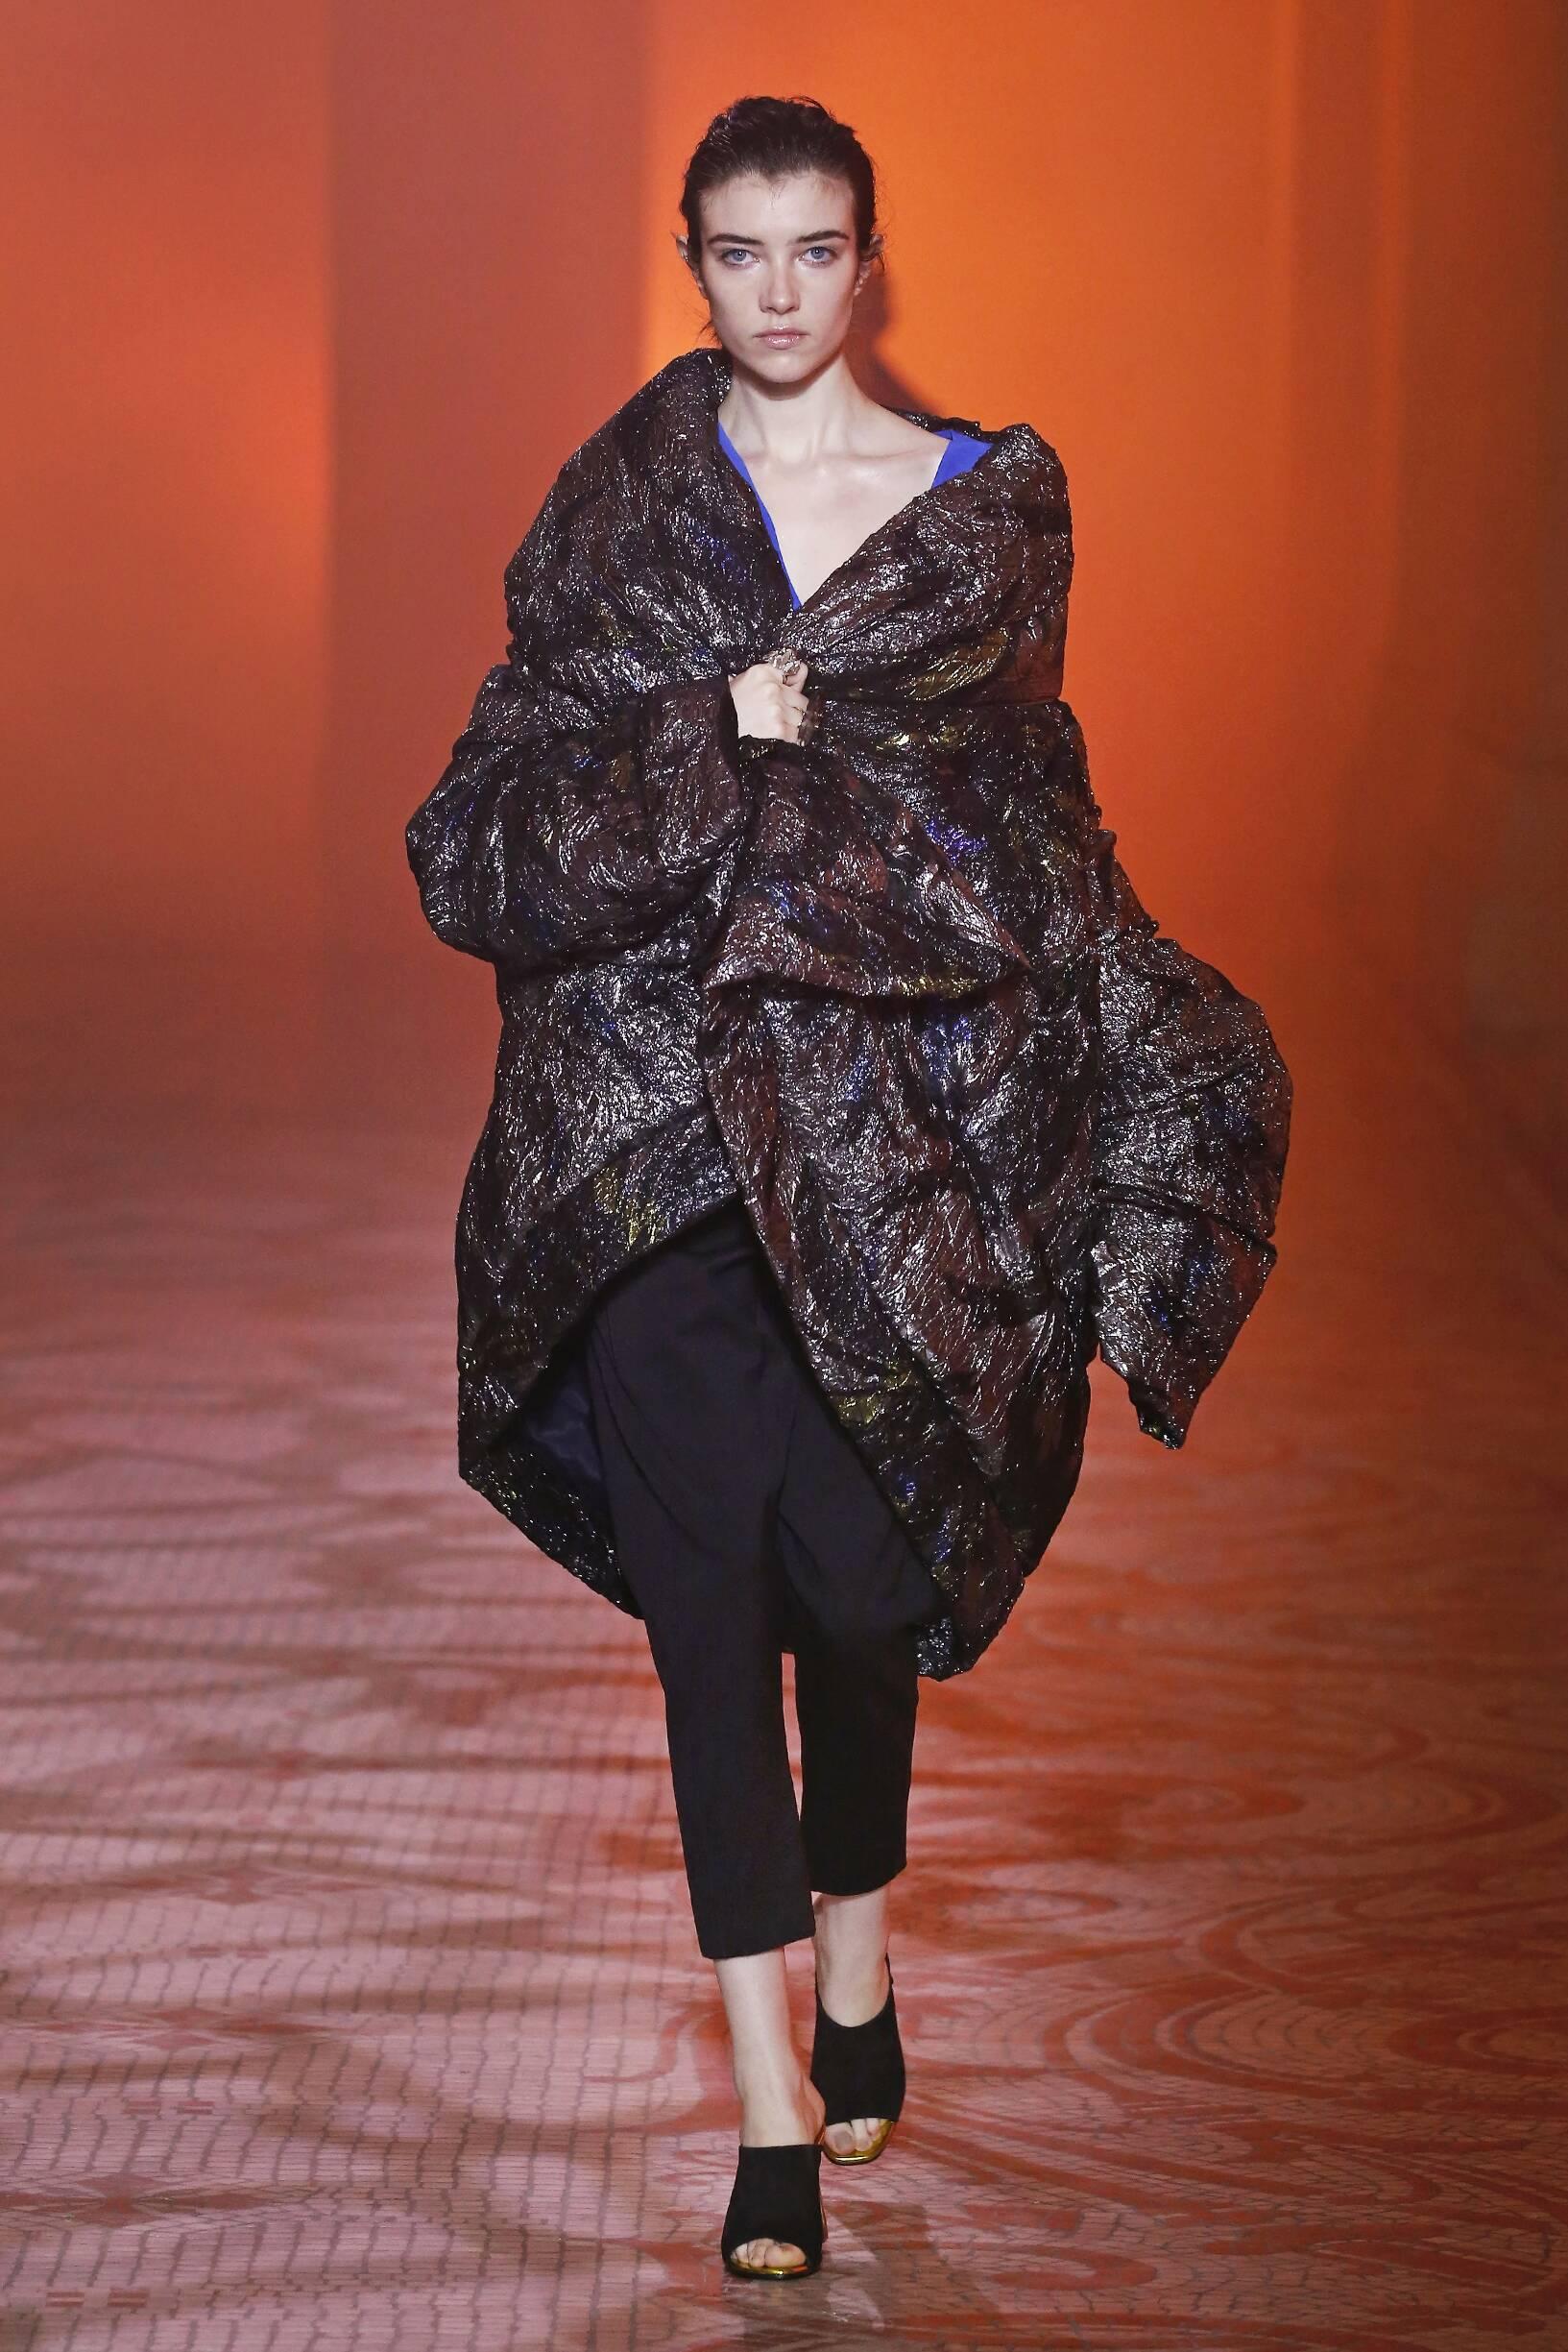 Model Fashion Show Poiret